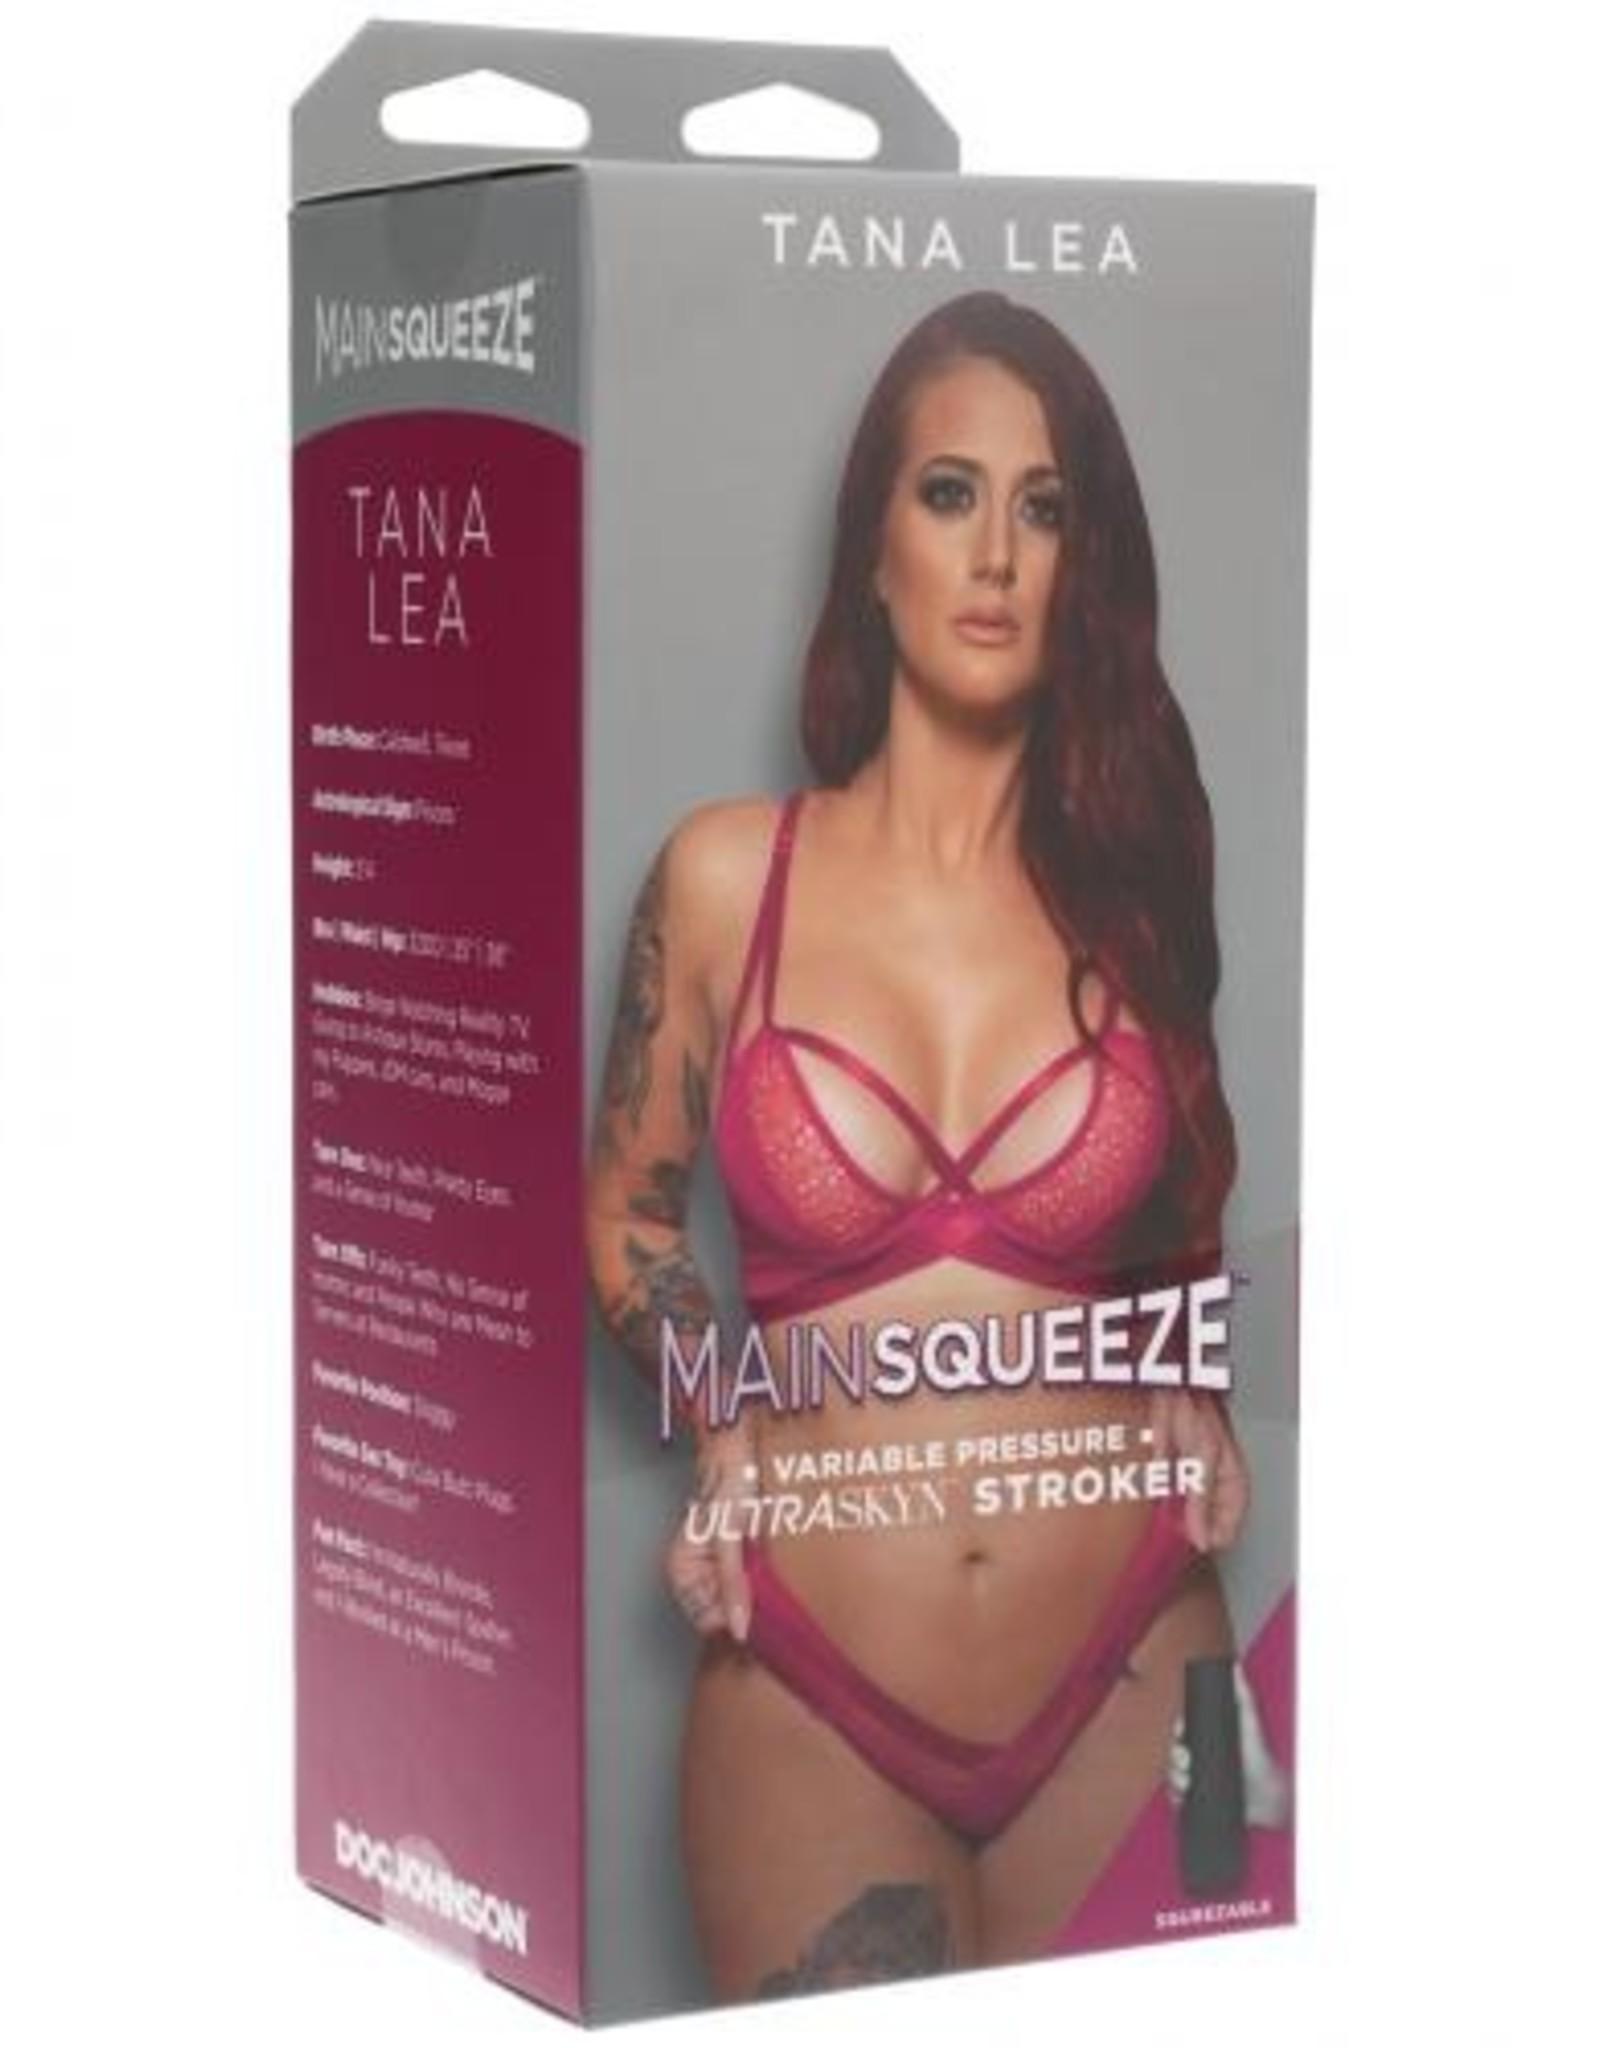 Main Squeeze Main Squeeze Tana Lea